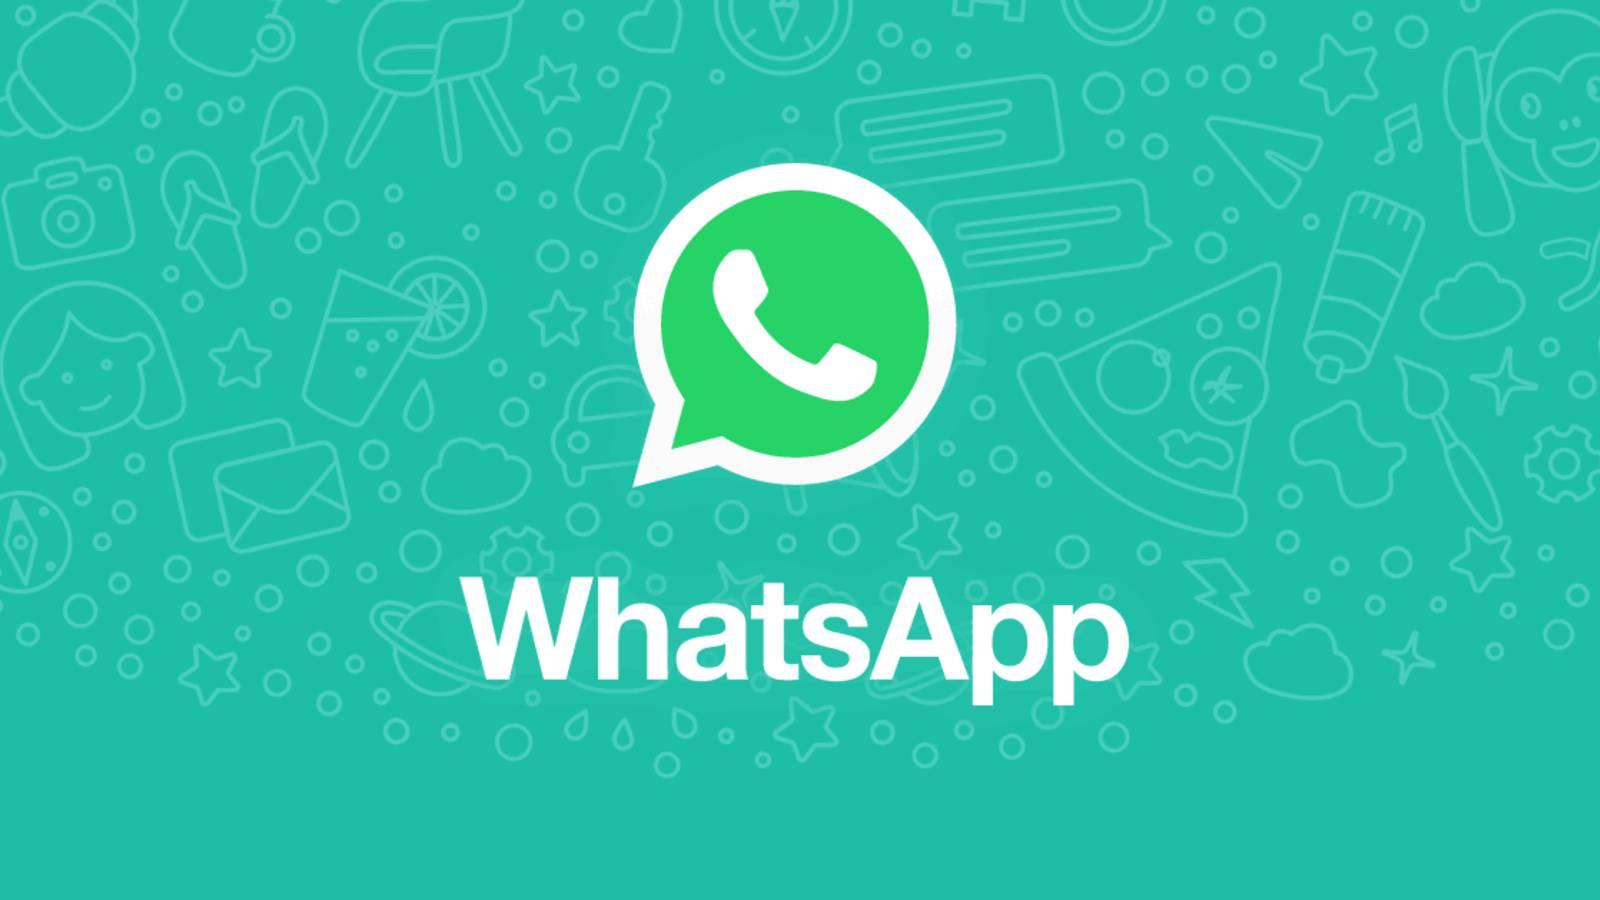 WhatsApp continut